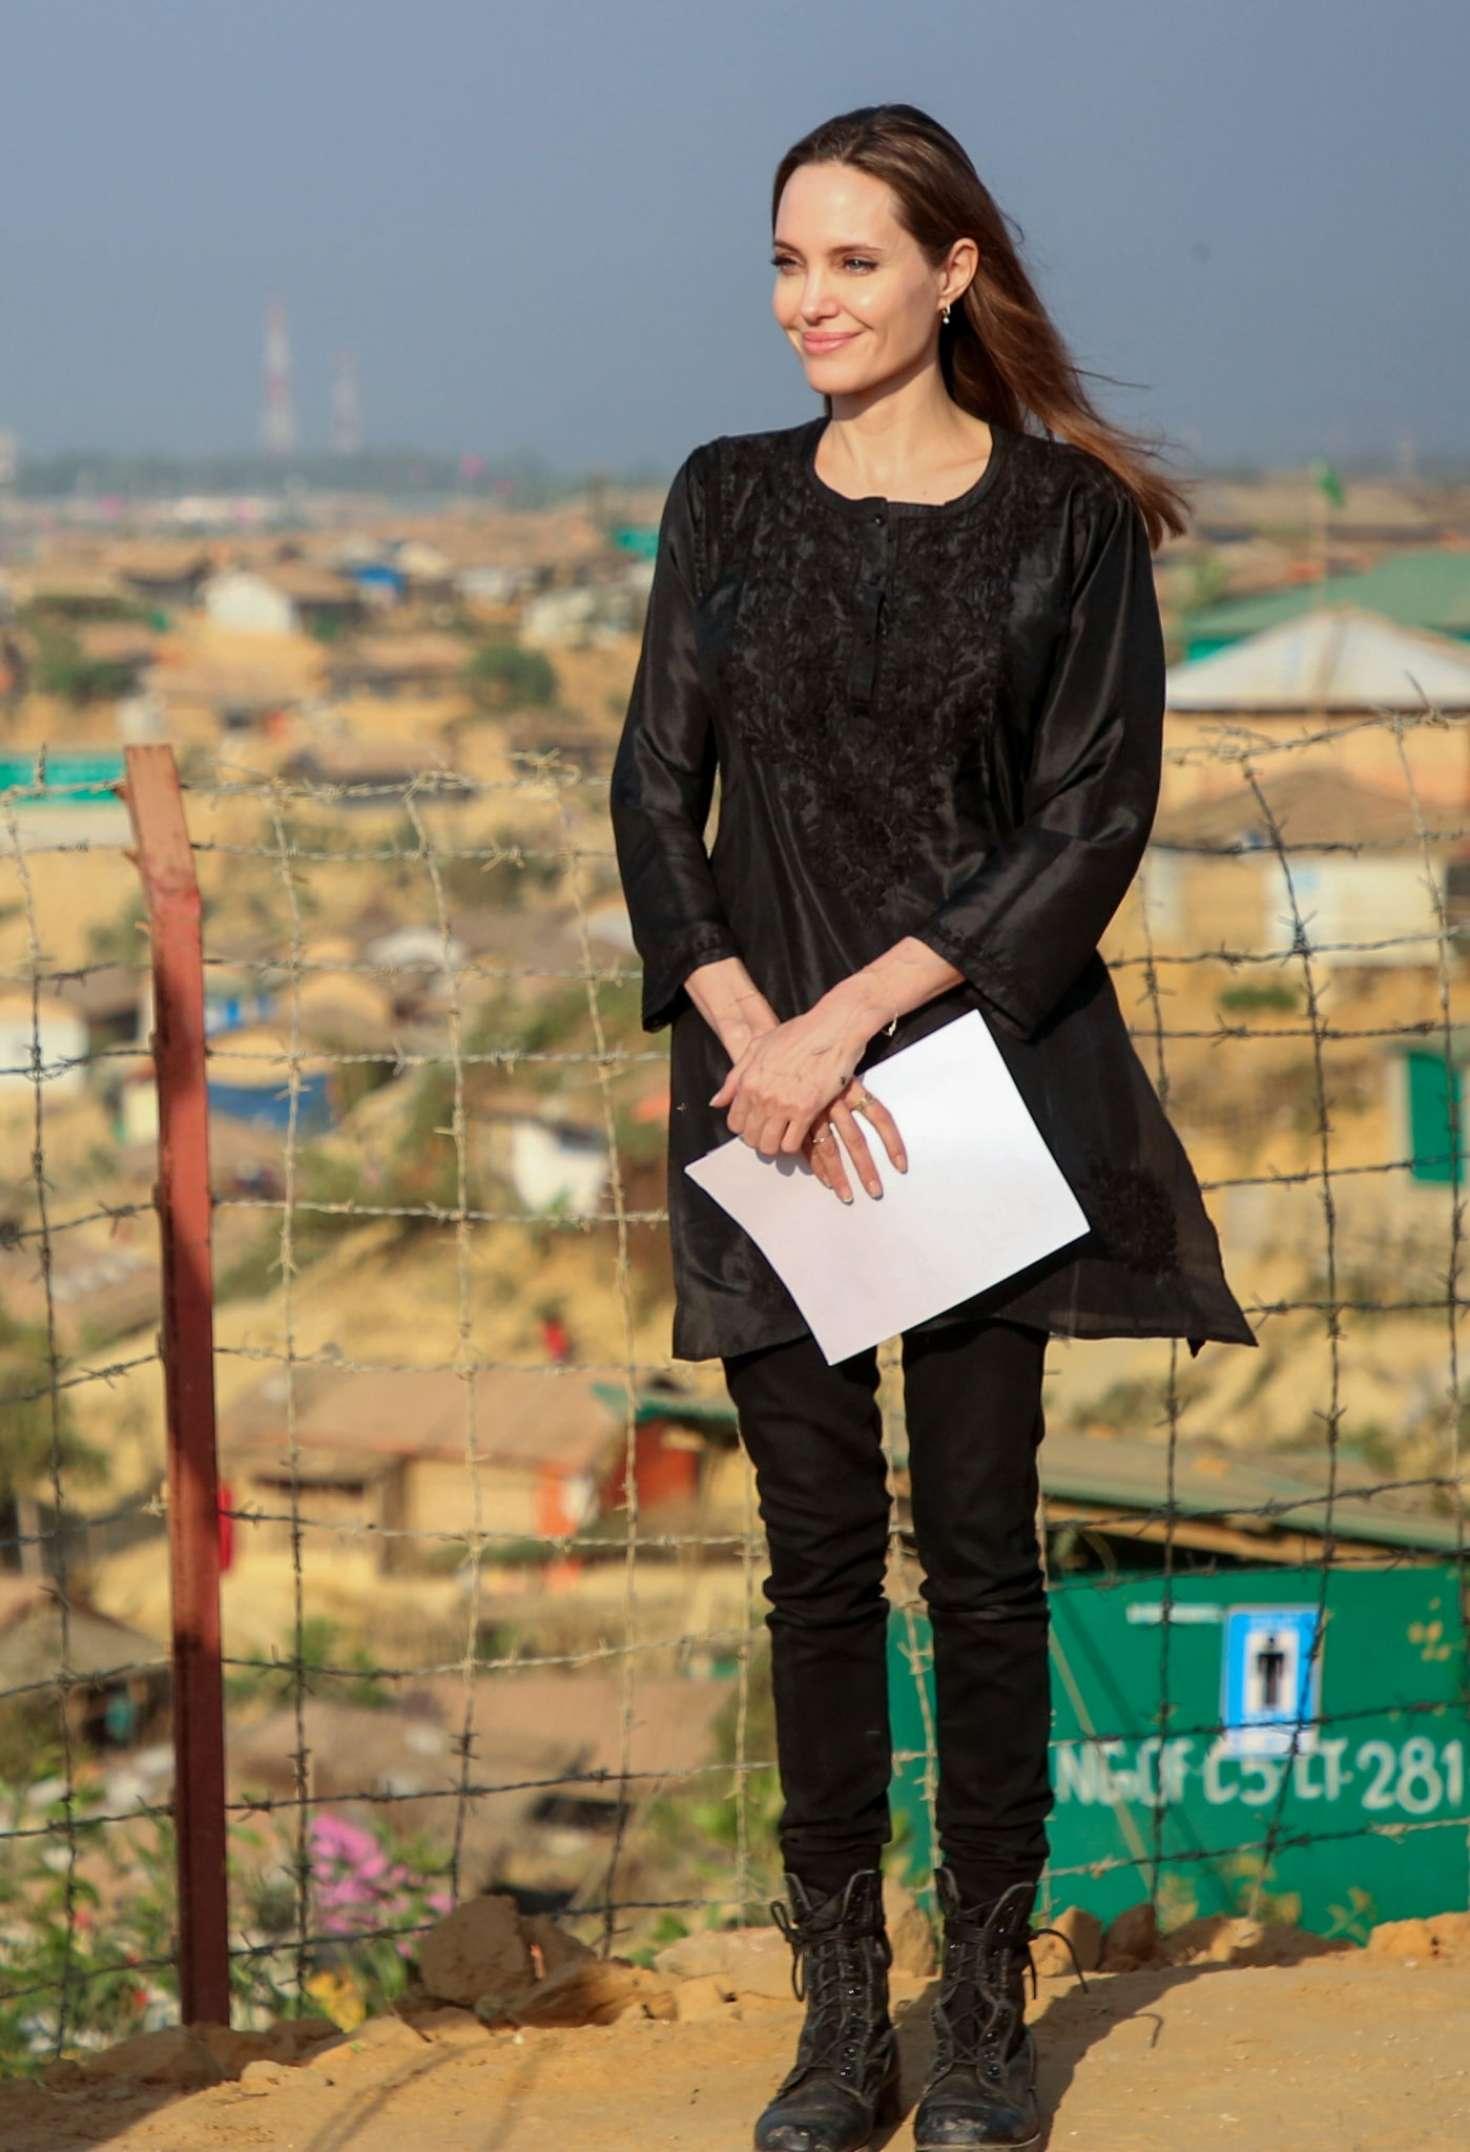 Angelina Jolie - UNHCR special envoy to Kutupalong Rohingya refugee camp in Bangladesh